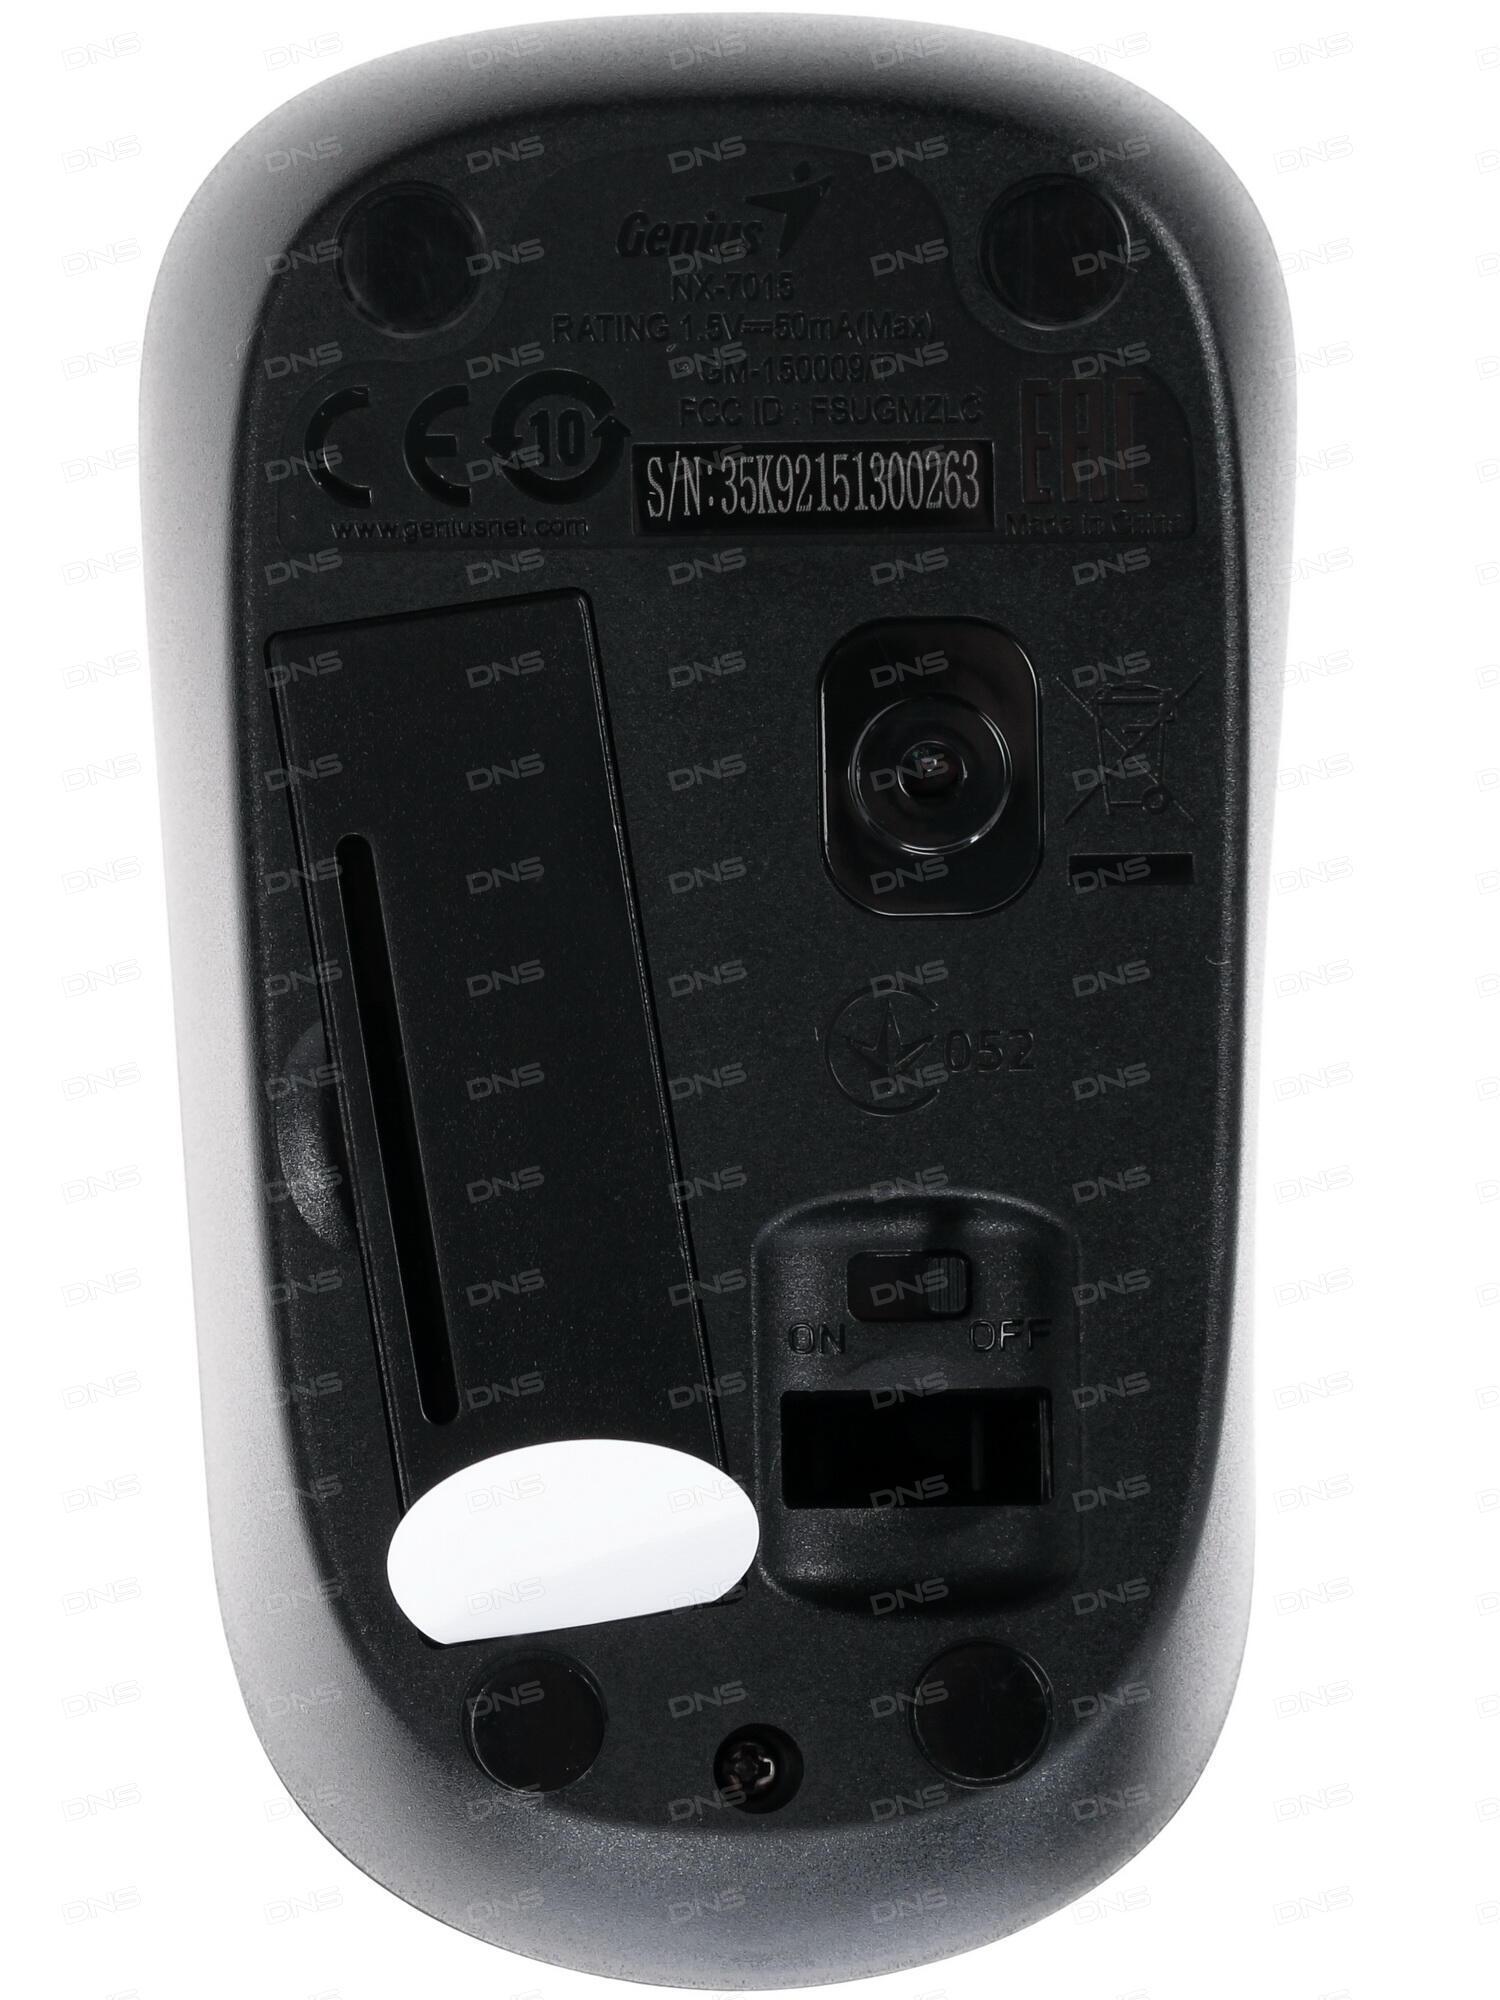 Мышь Genius NX-7010  беспроводная 2,4ГГц 1200dpi WH+Red